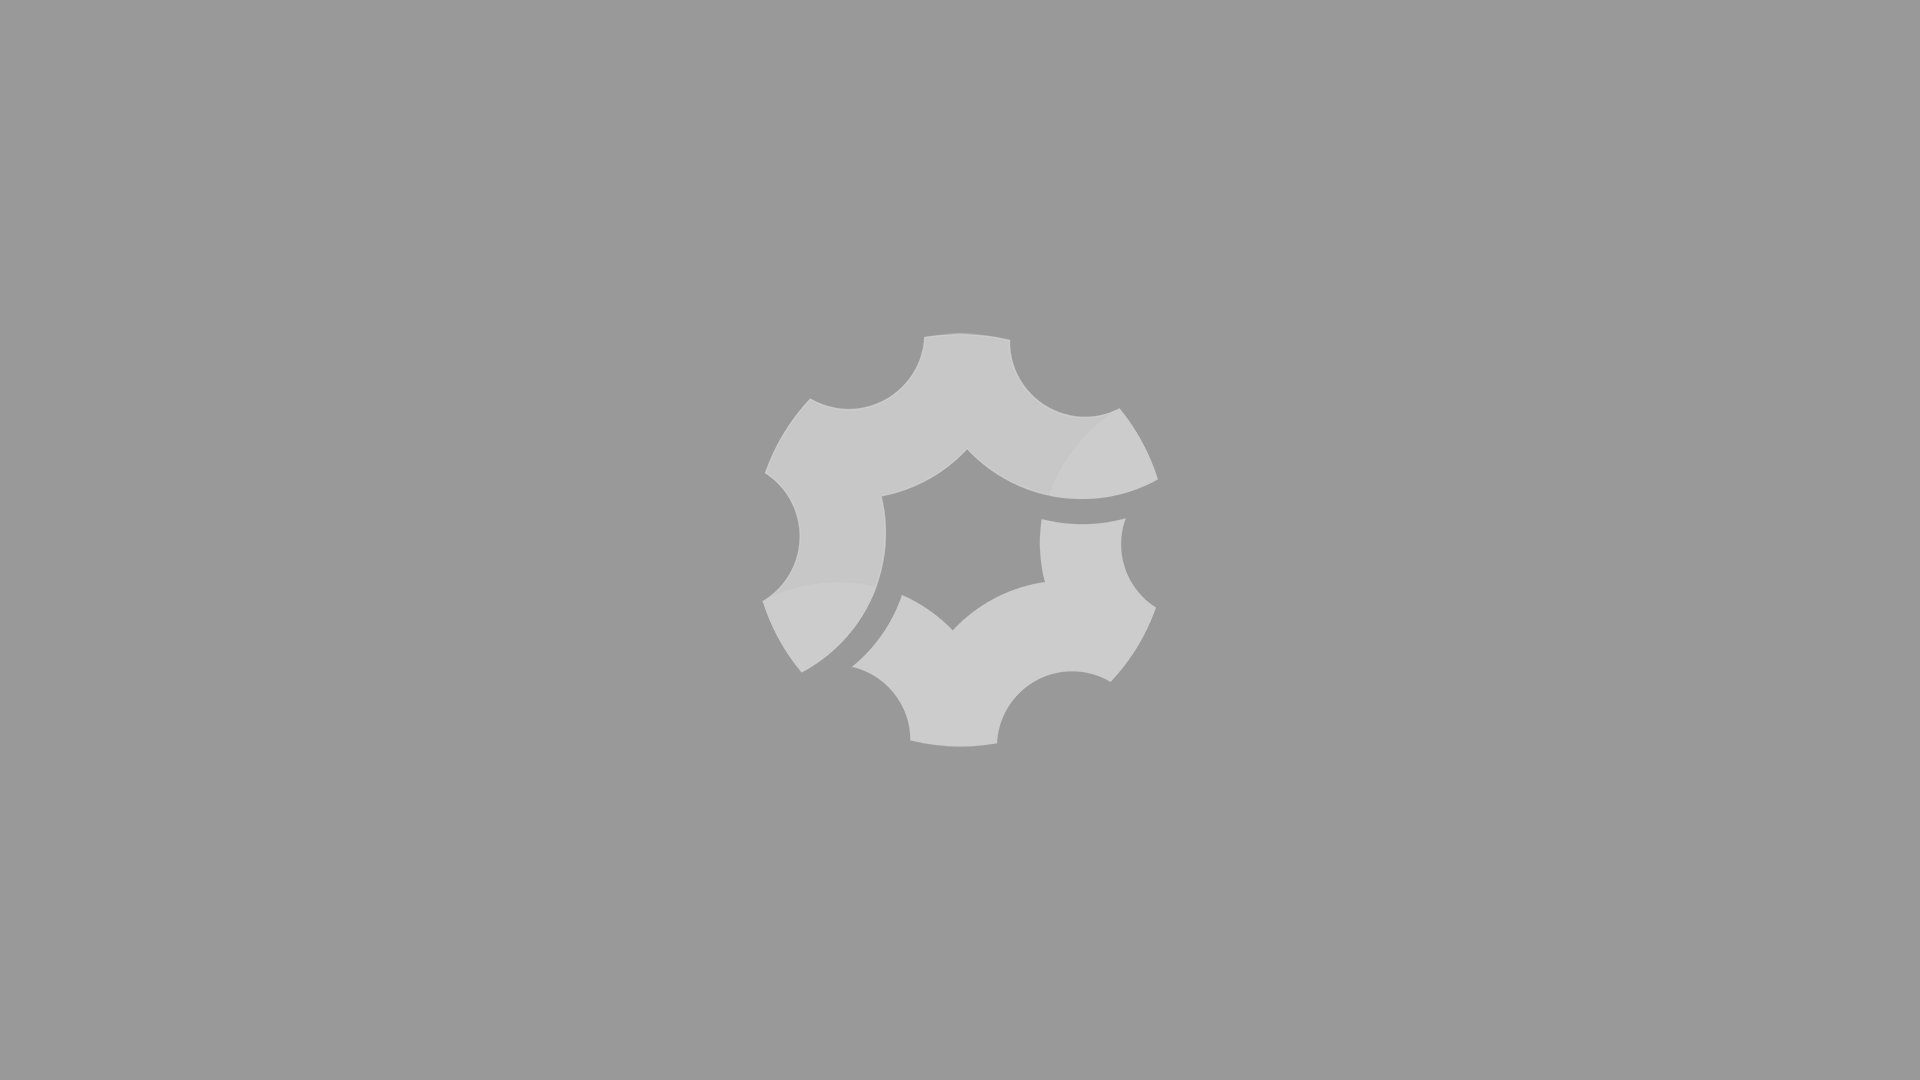 insurgency_sandstorm_screenshot_2020.05.01_-_00.09.49.38.png